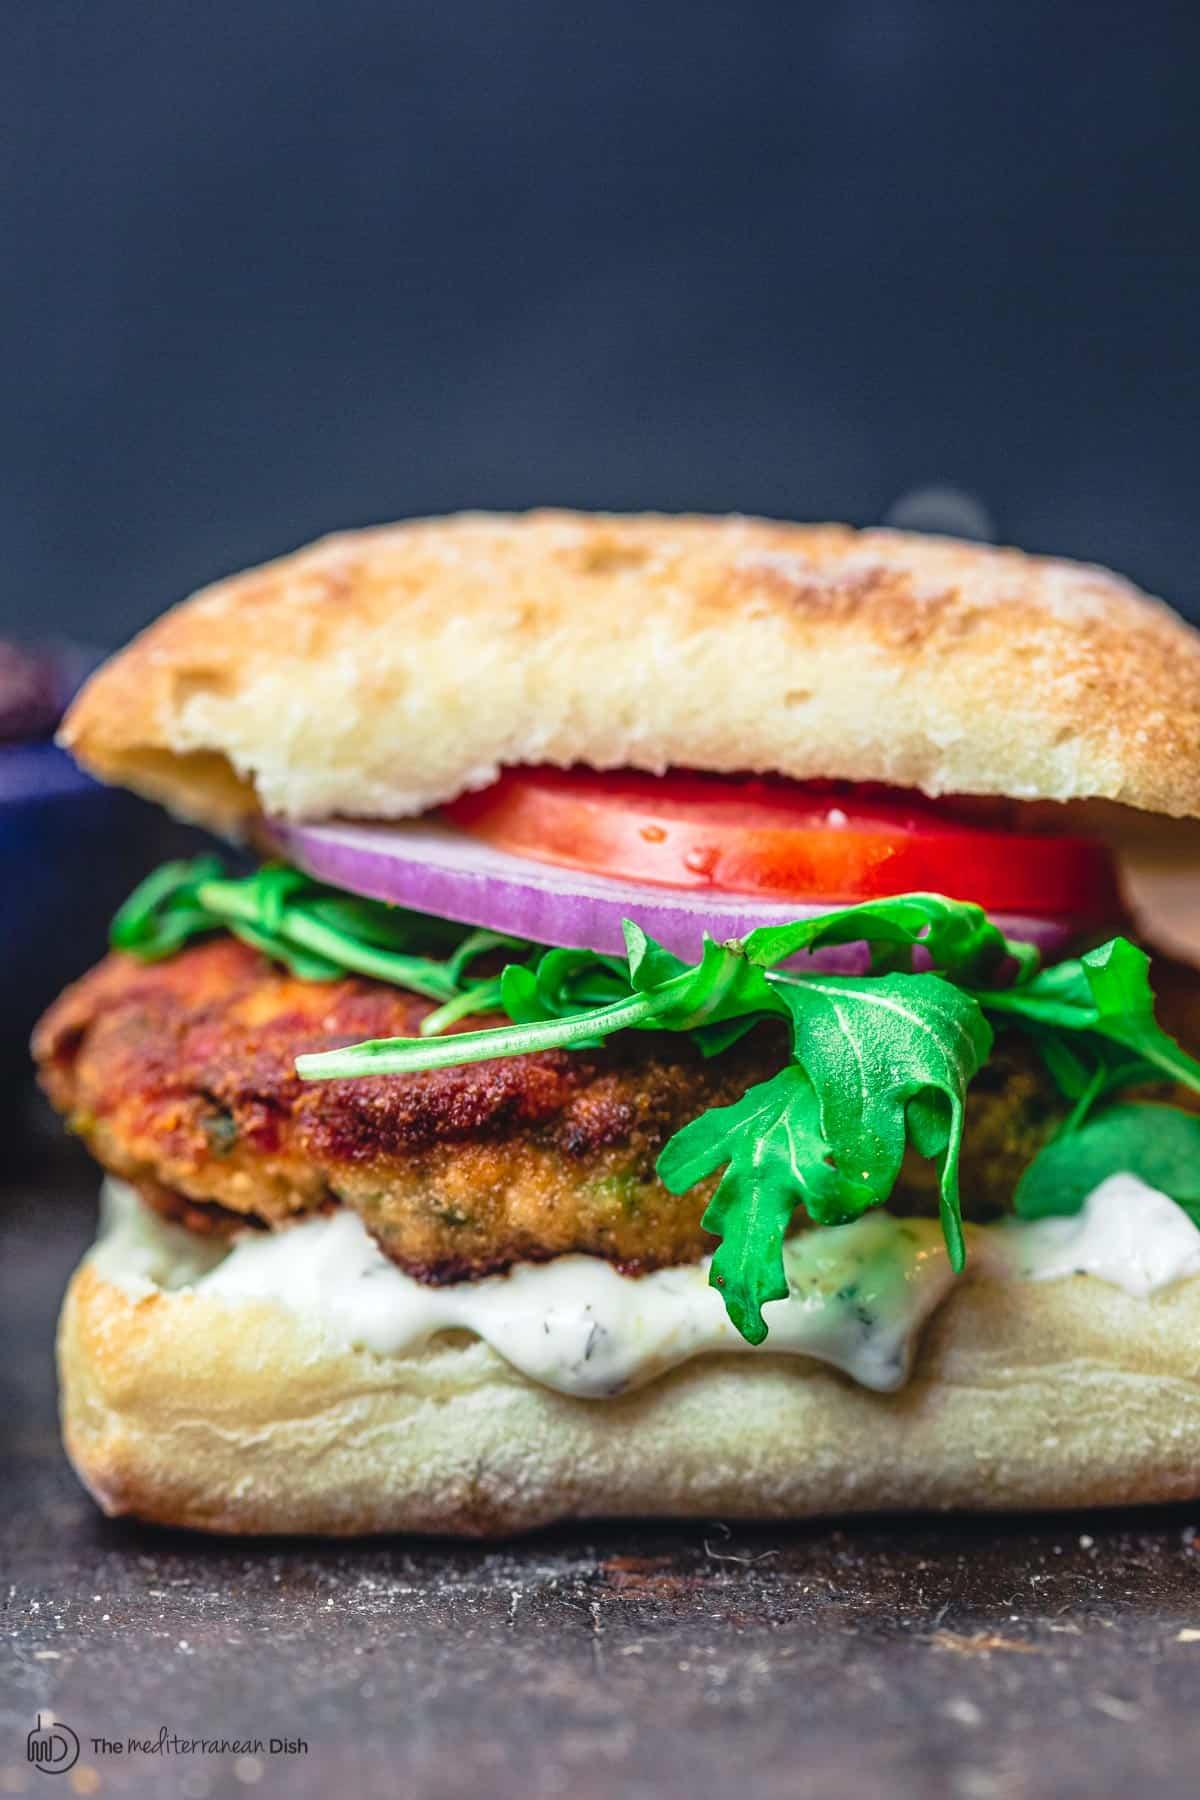 juicy Mediterranean-style salmon burgers in ciabatta bun